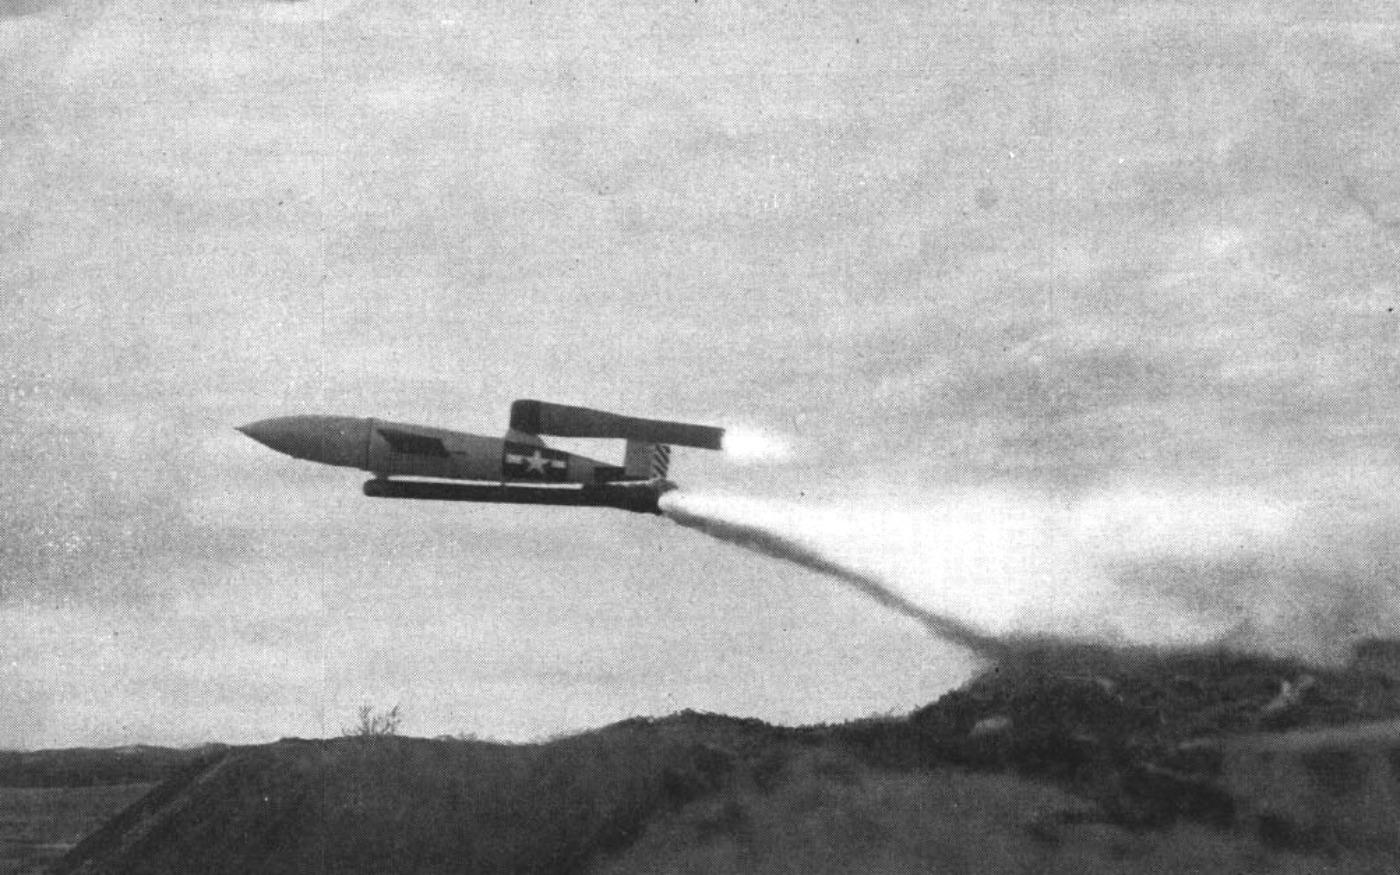 Loon: America's Forgotten World War II Cruise Missile